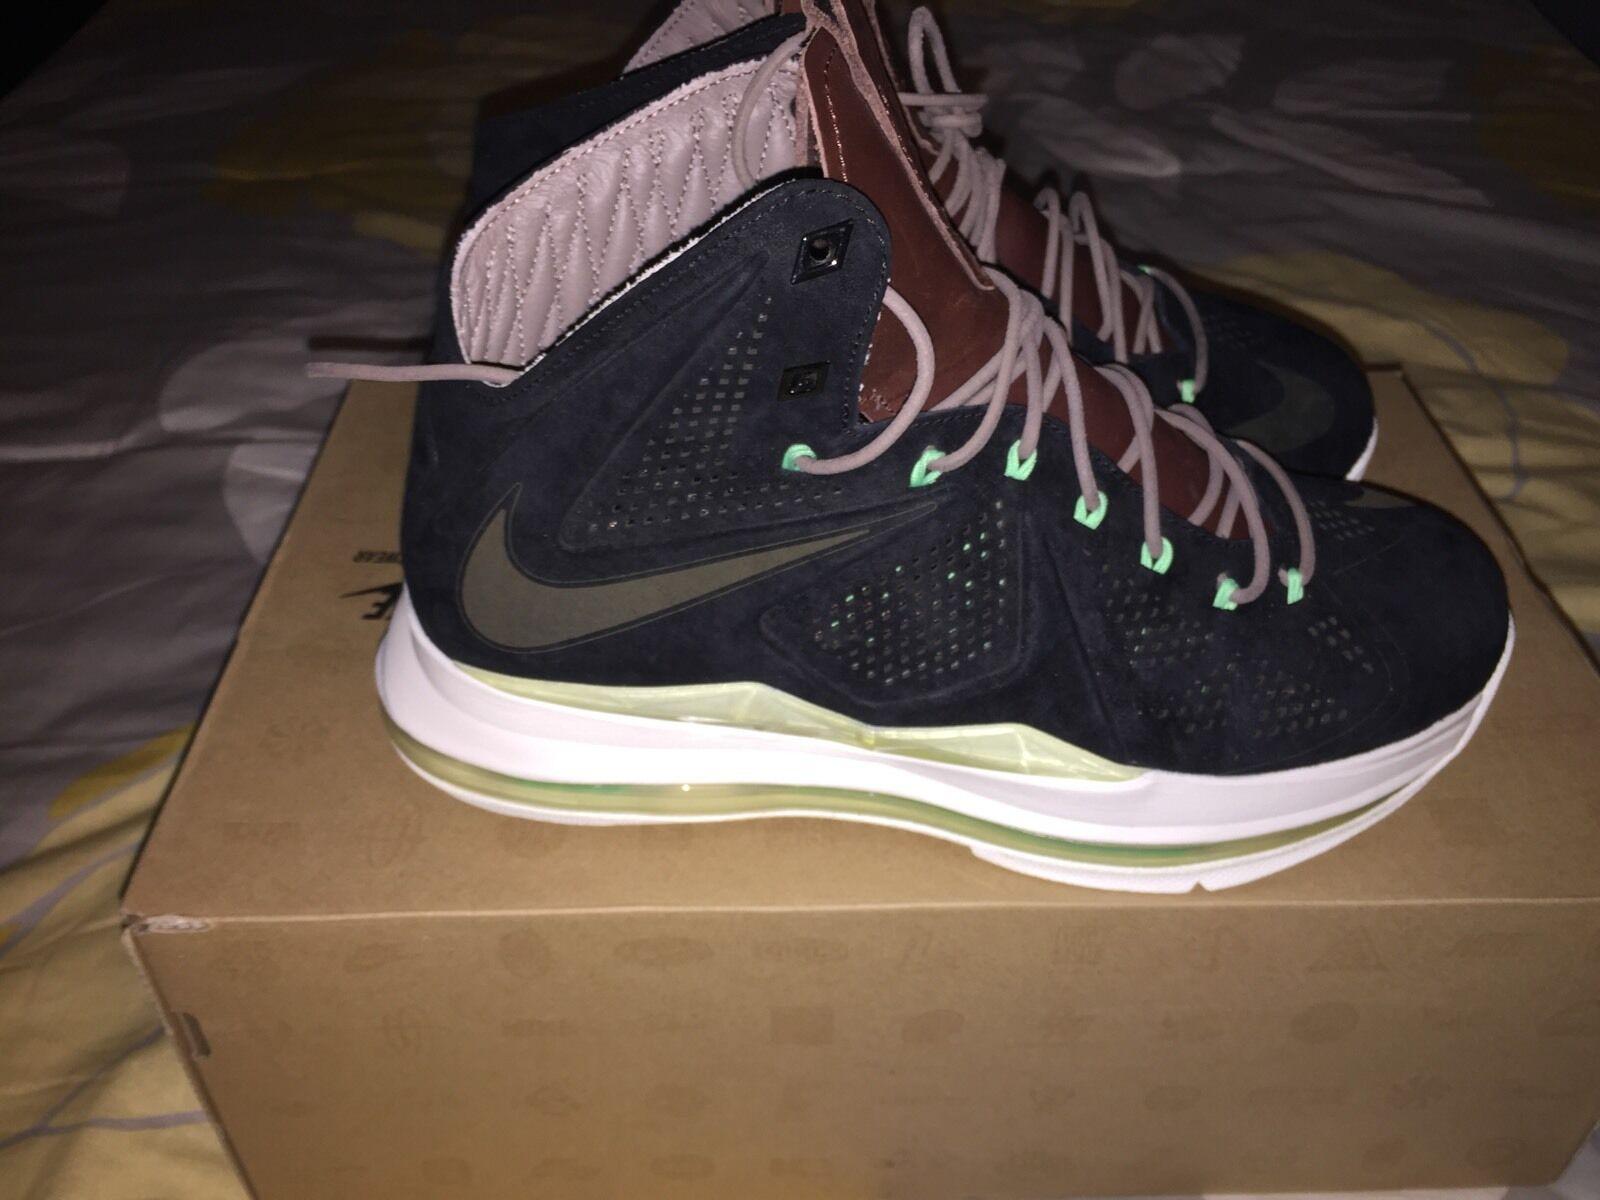 Nike lebron 10 x ext nero n mint limitate dimensioni 8